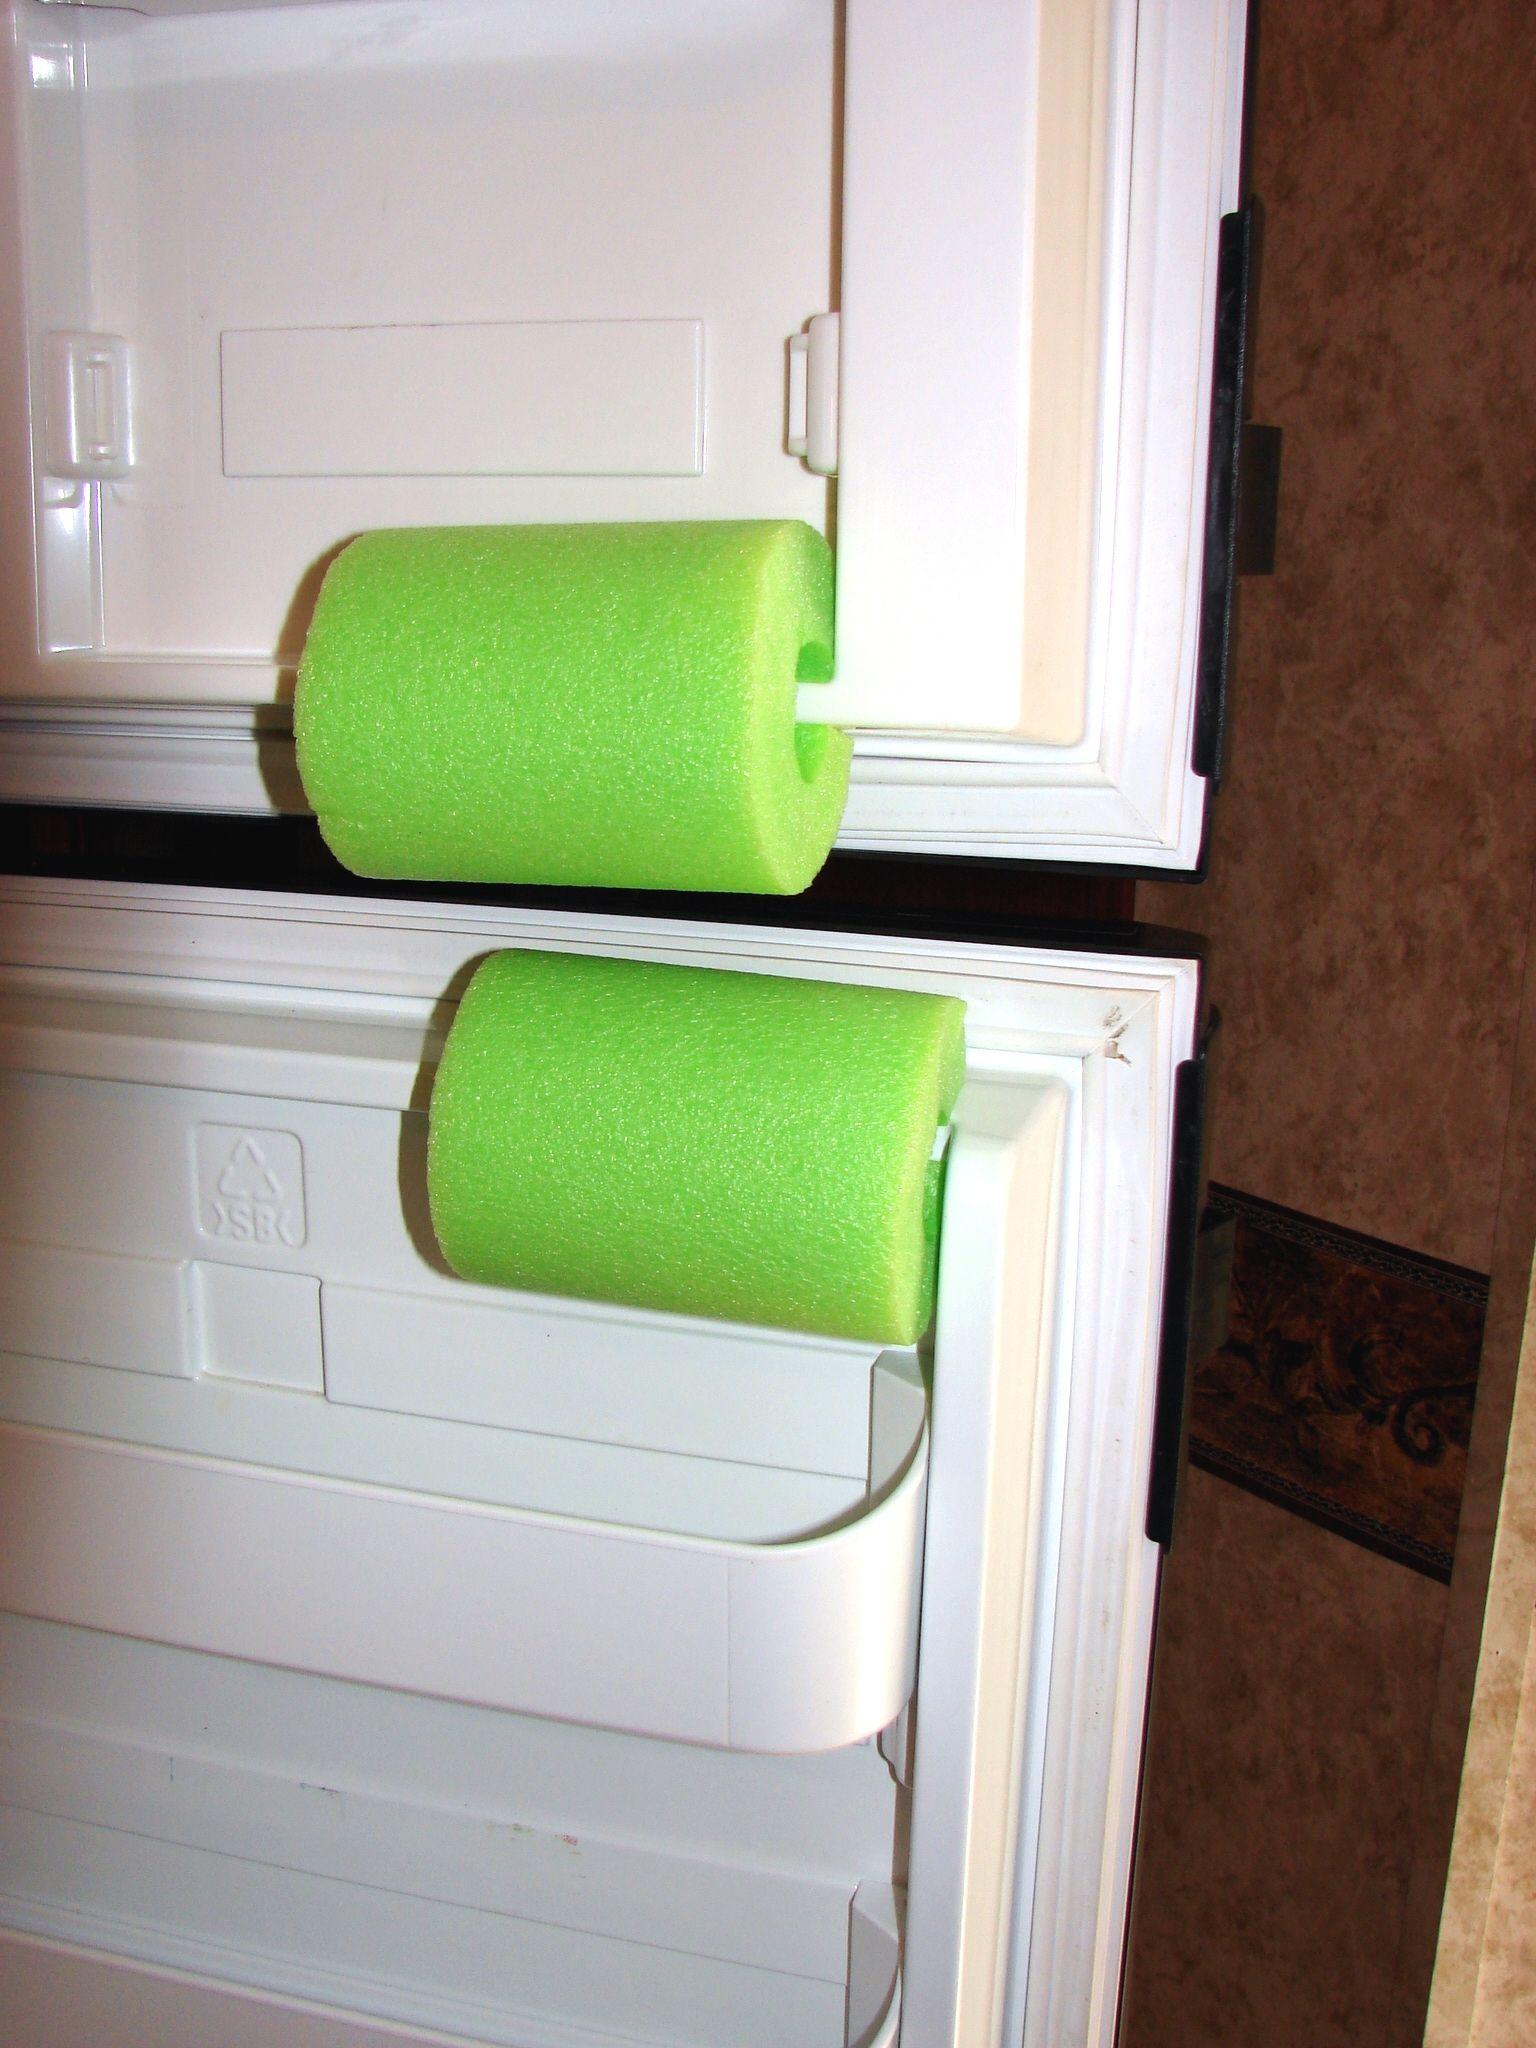 Rv Small Bathroom Design Tips on small interior design, small bathroom decorating tips, kitchen design tips, small bathroom design portfolio, small bathroom lighting tips, home design tips, small bathroom design solutions, bedroom design tips, small bathroom flooring tips, small bathroom design inspiration, small bedroom tips, hallway design tips, small kitchen tips, small bathroom design software, small bathroom design plans, small bathroom design examples, small bathroom design layouts, small modern bathroom design, paint design tips, room design tips,